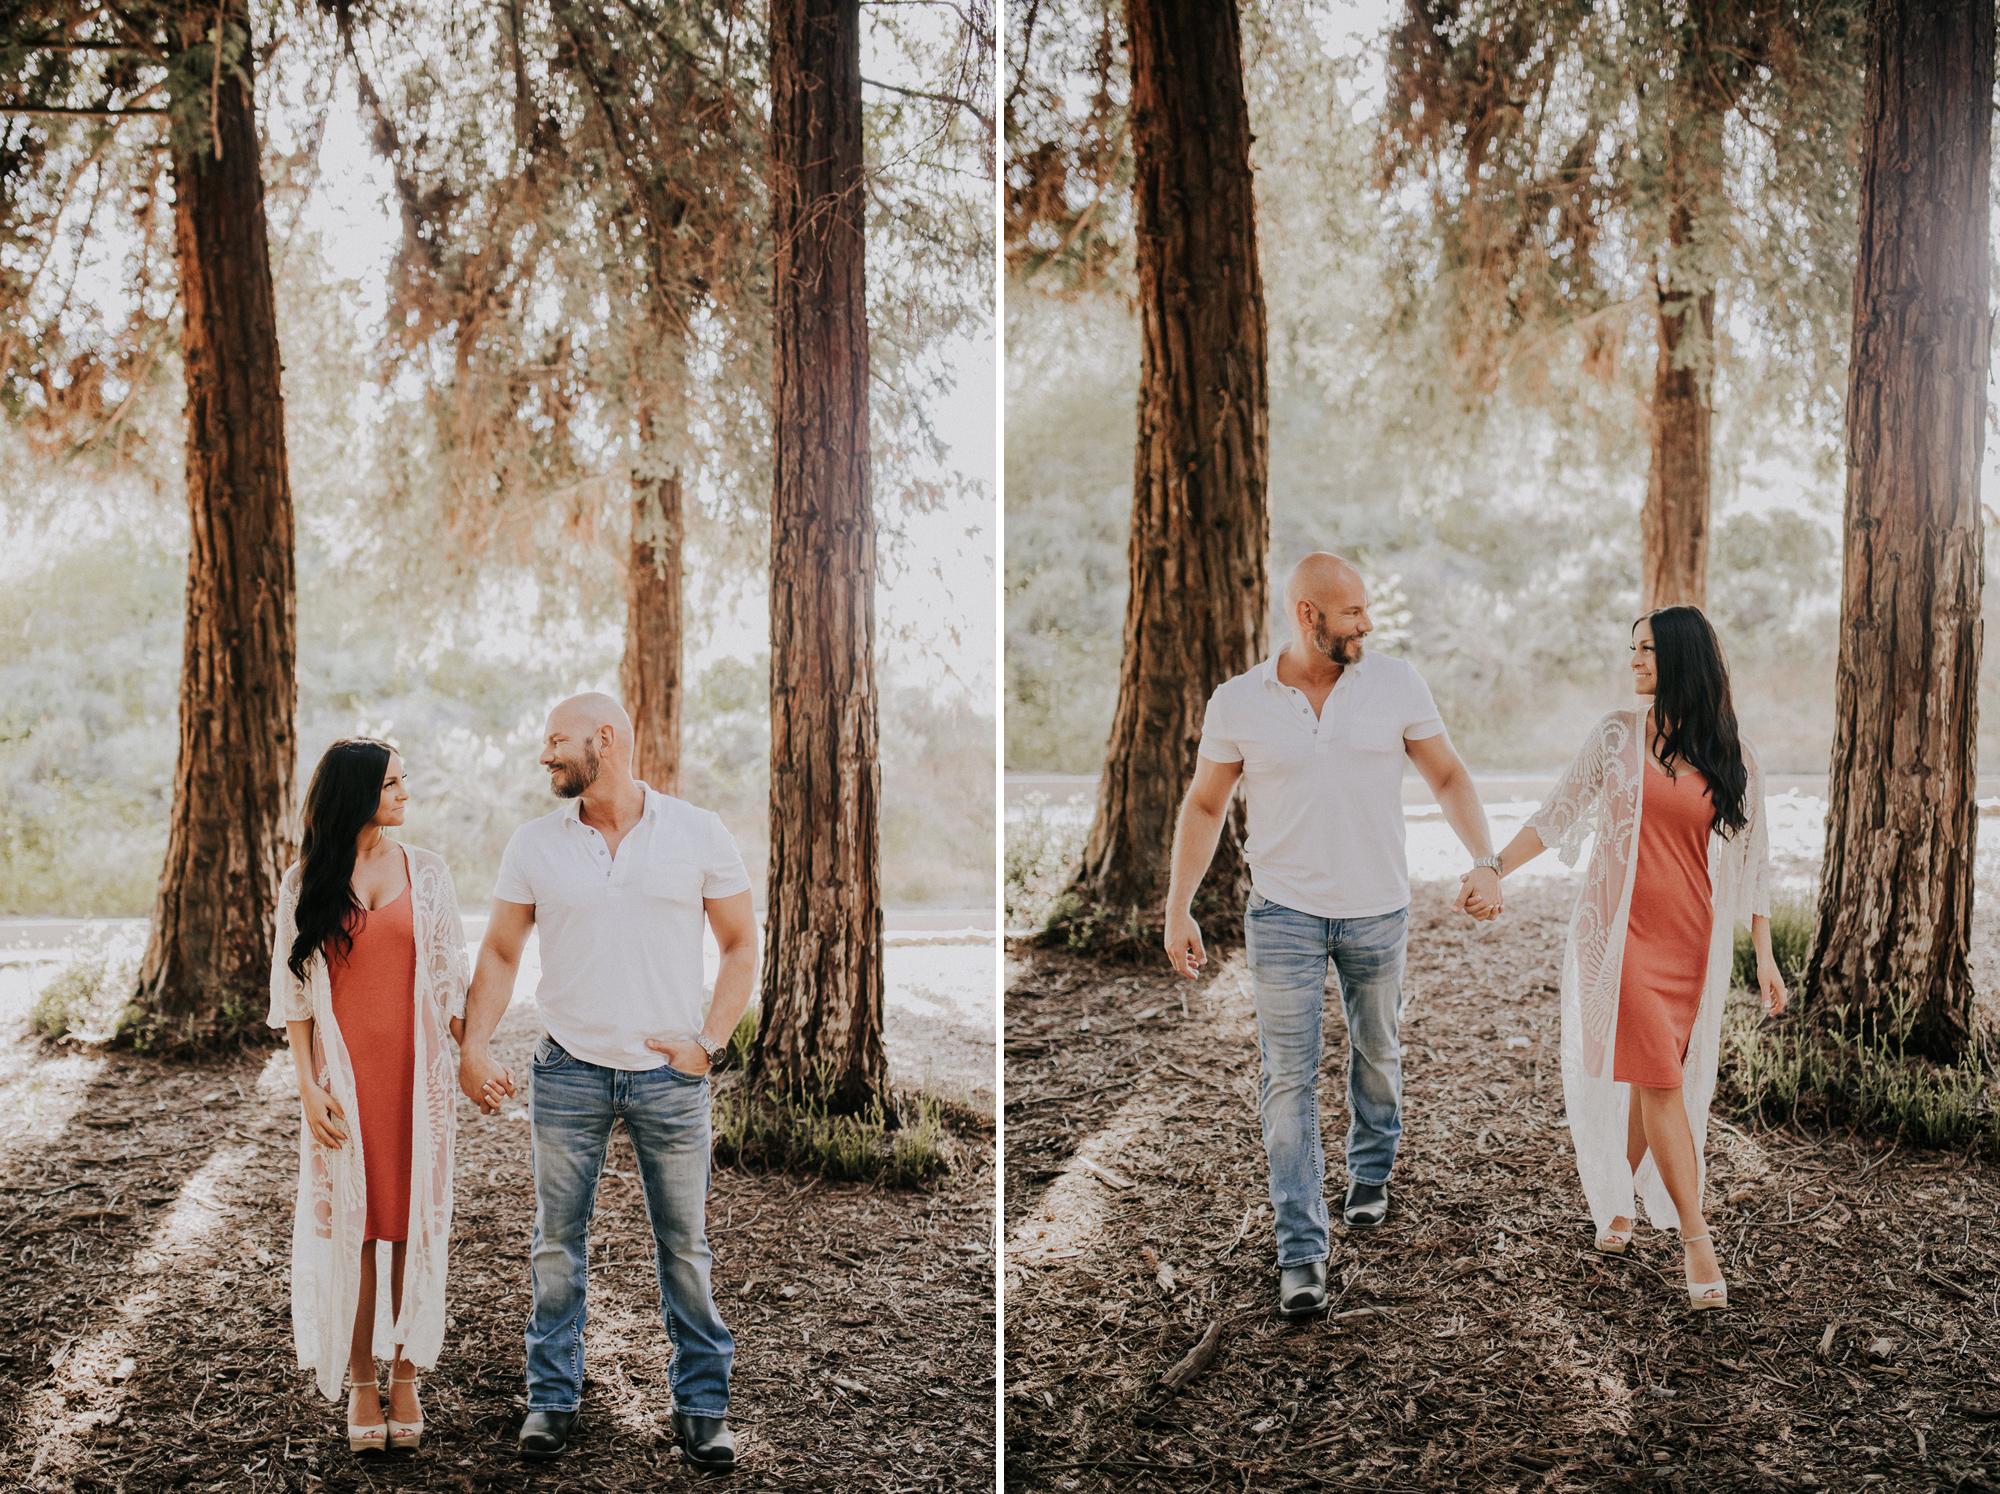 005-california-engagement-shoot-redwoods-san-diego.jpg